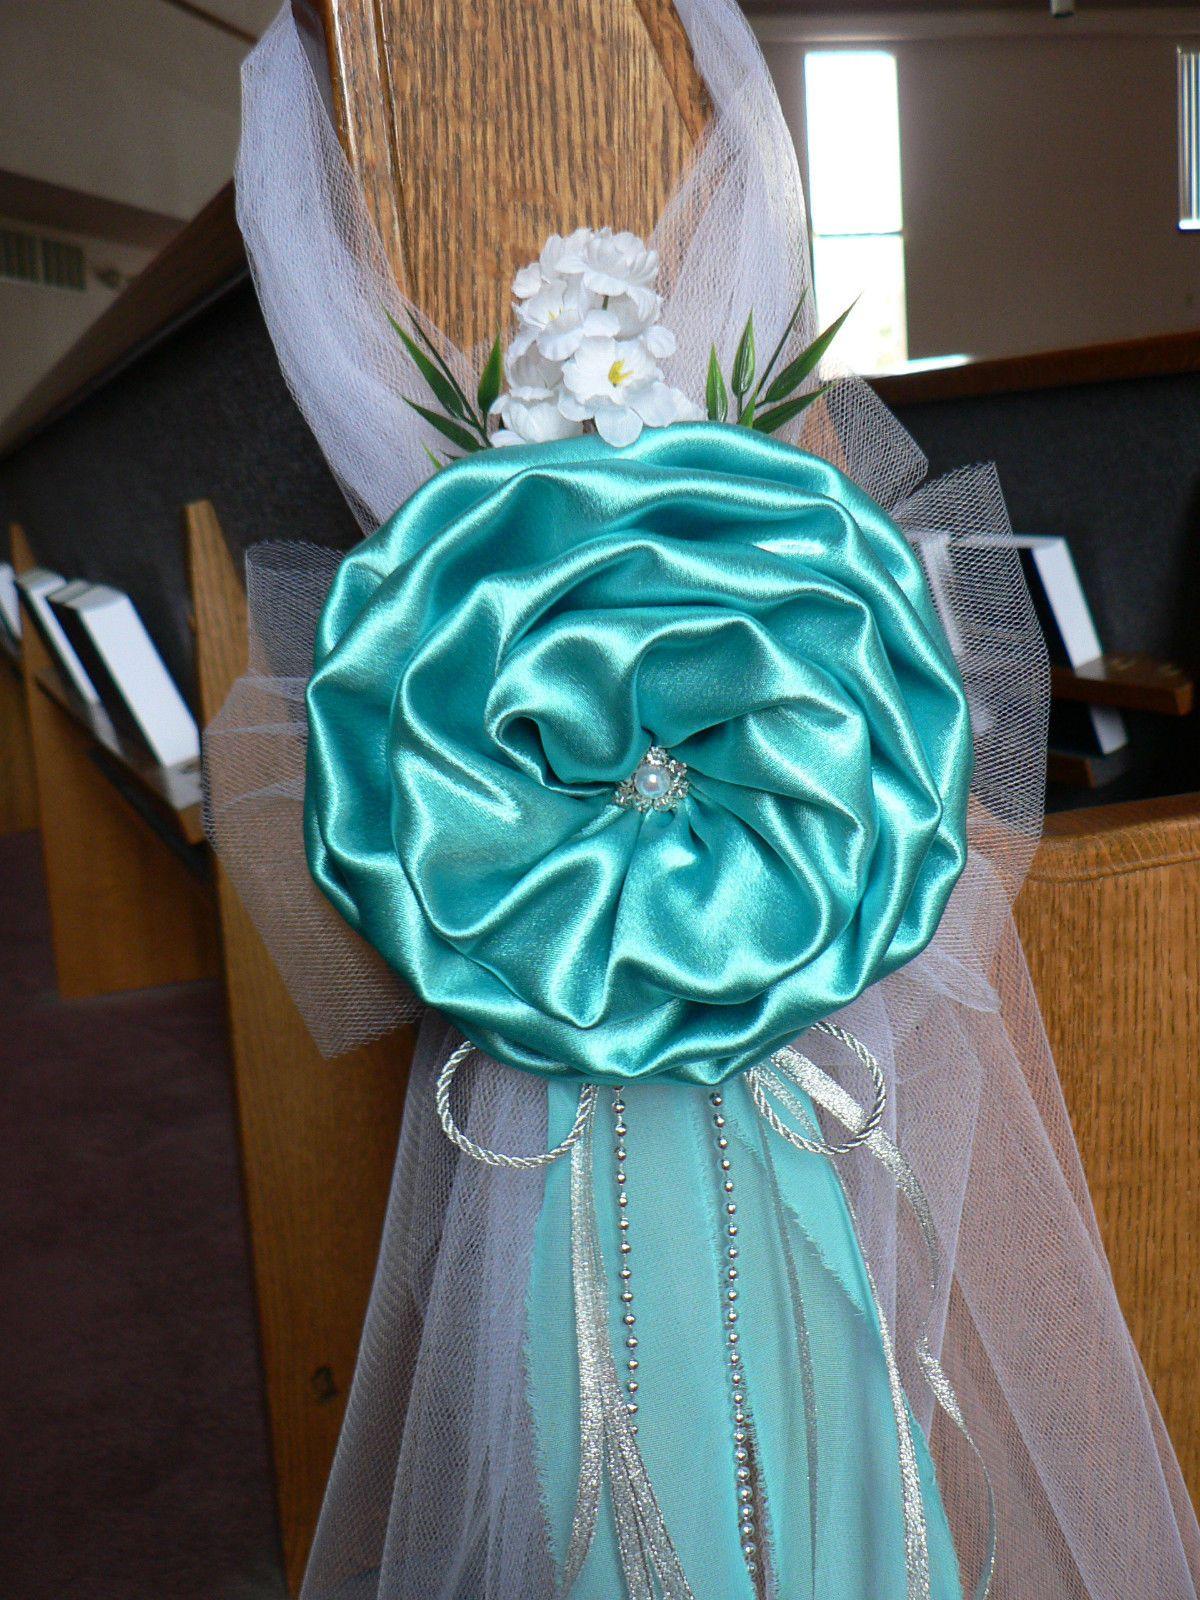 tiffany blue wedding chair covers joya rocking review decor bows pew silver